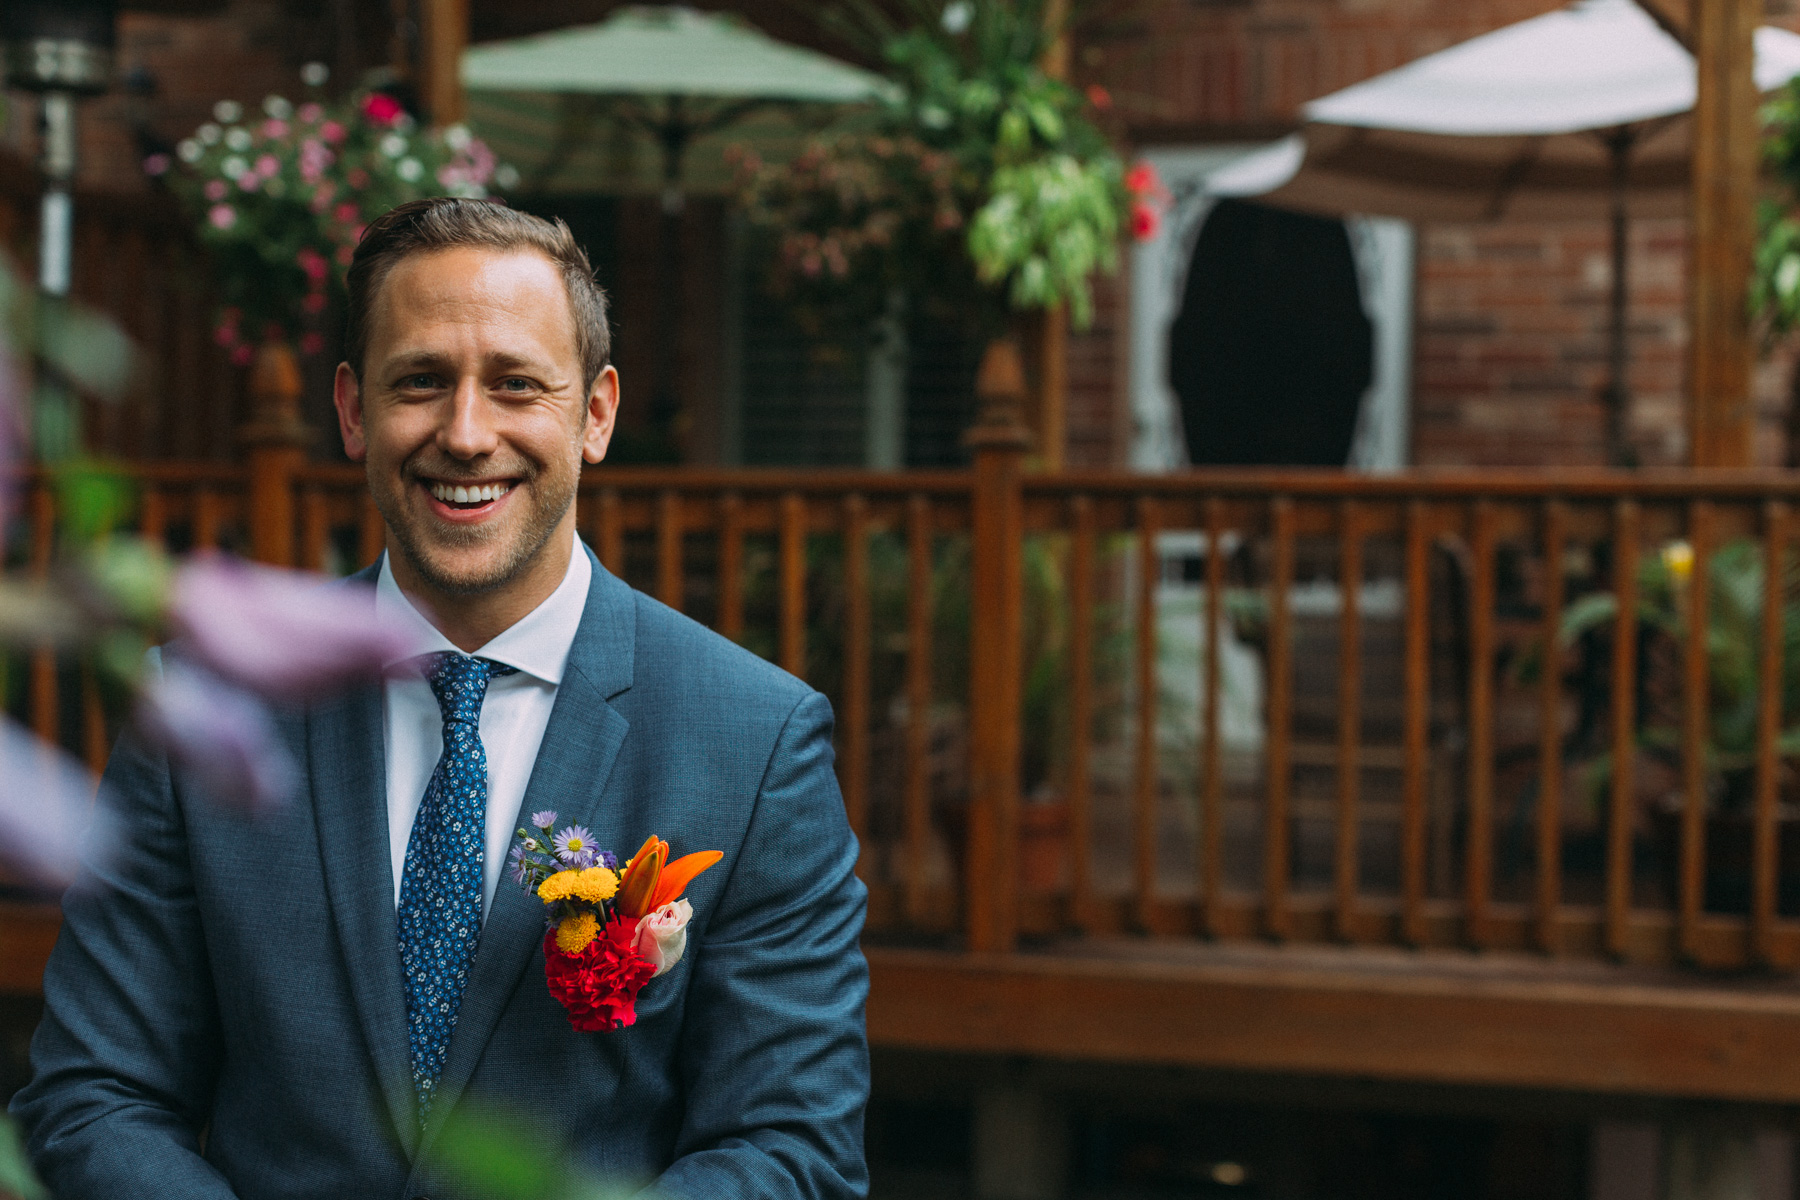 La-Maquette-wedding-by-Toronto-modern-wedding-photographer-Sam-Wong_10.jpg